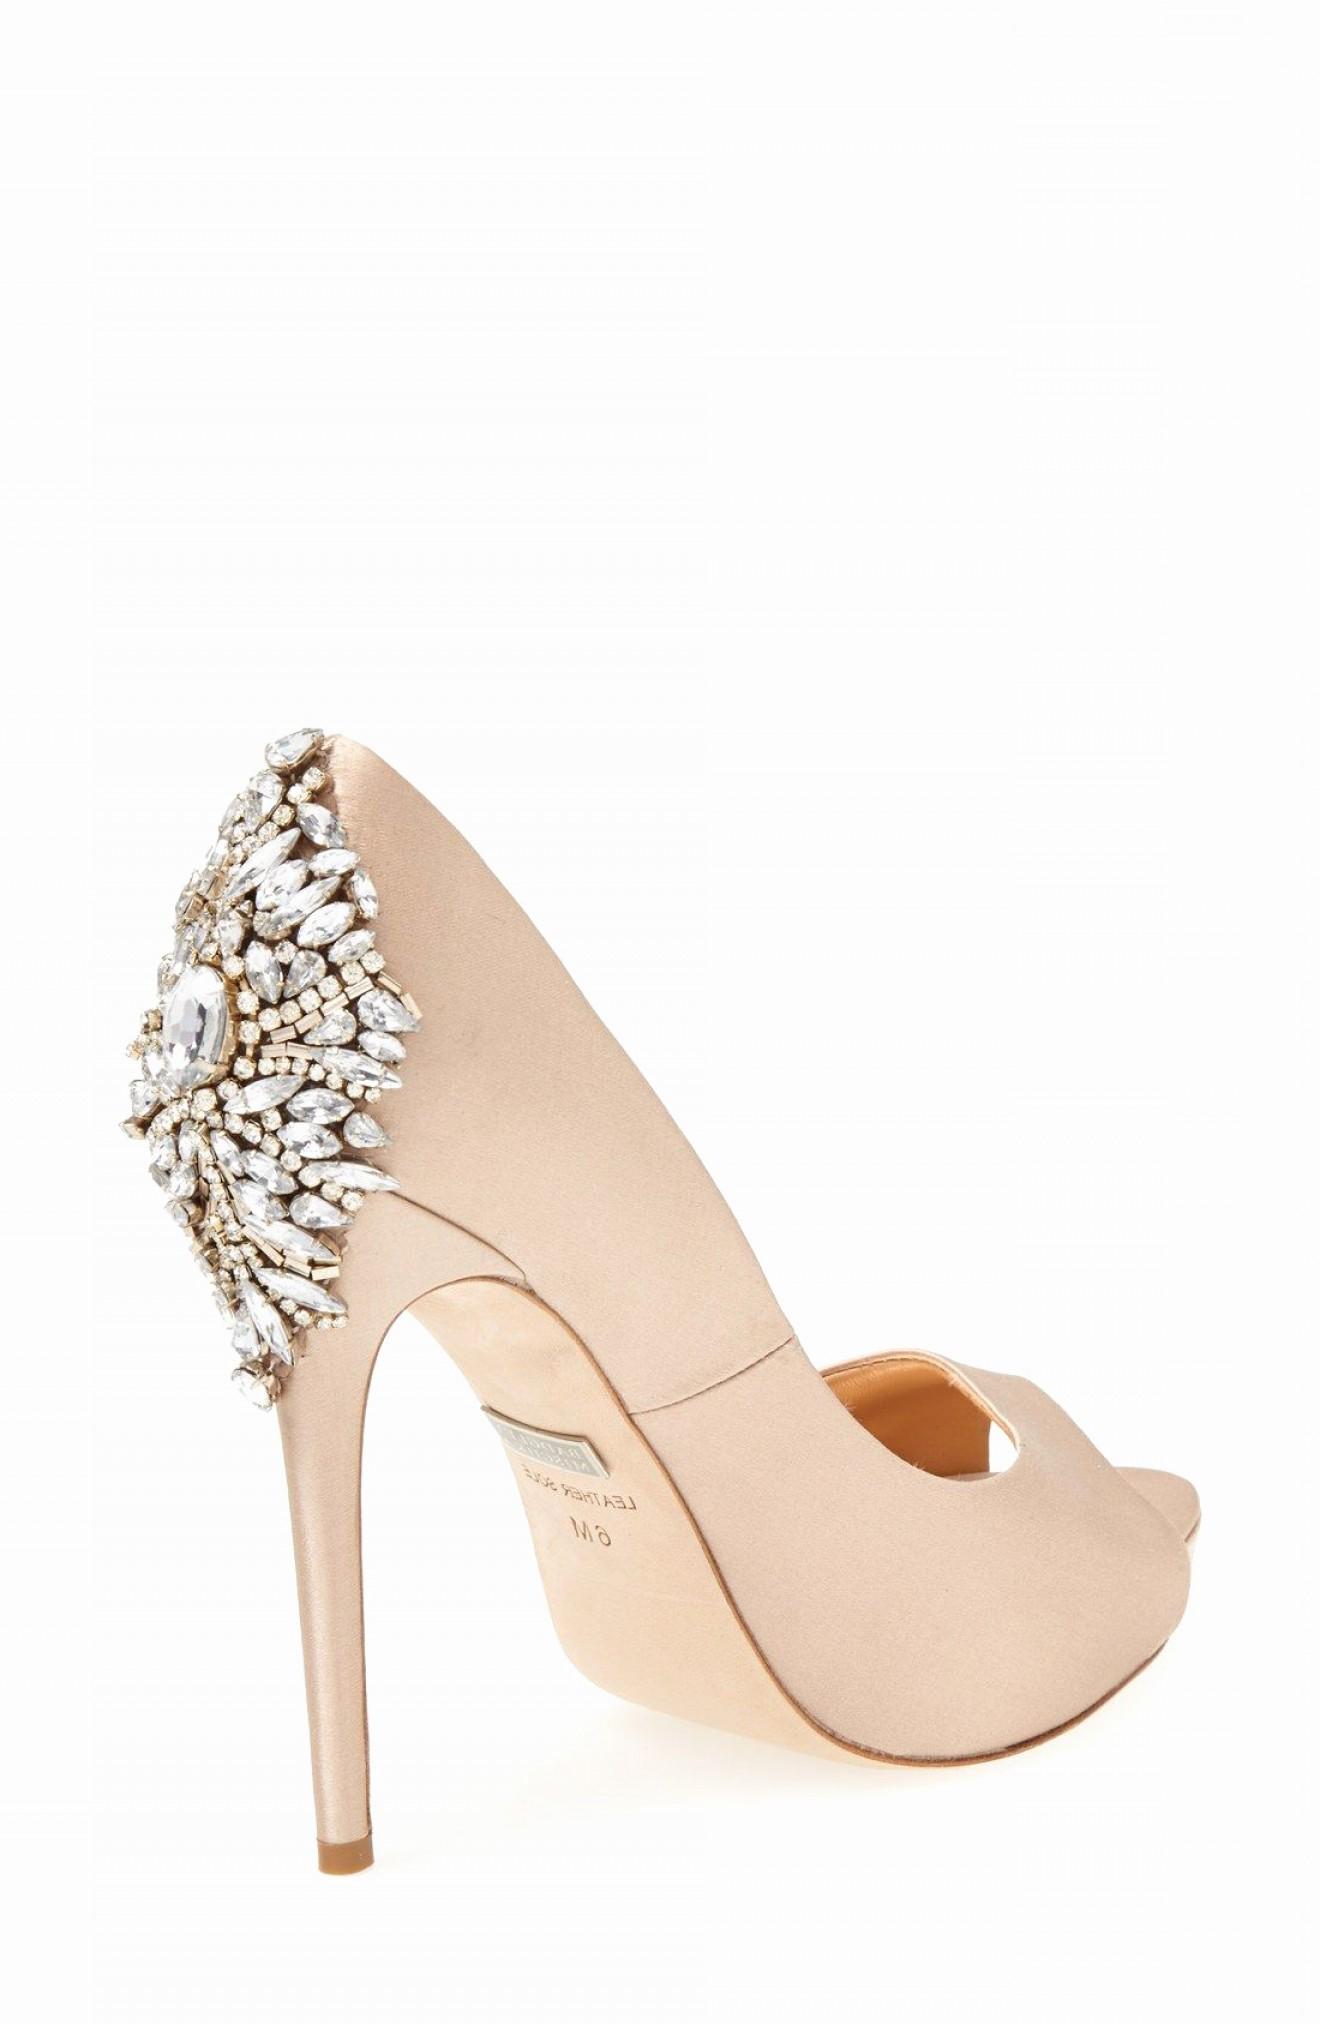 nordstrom badgley mischka bridal shoes photo - 1